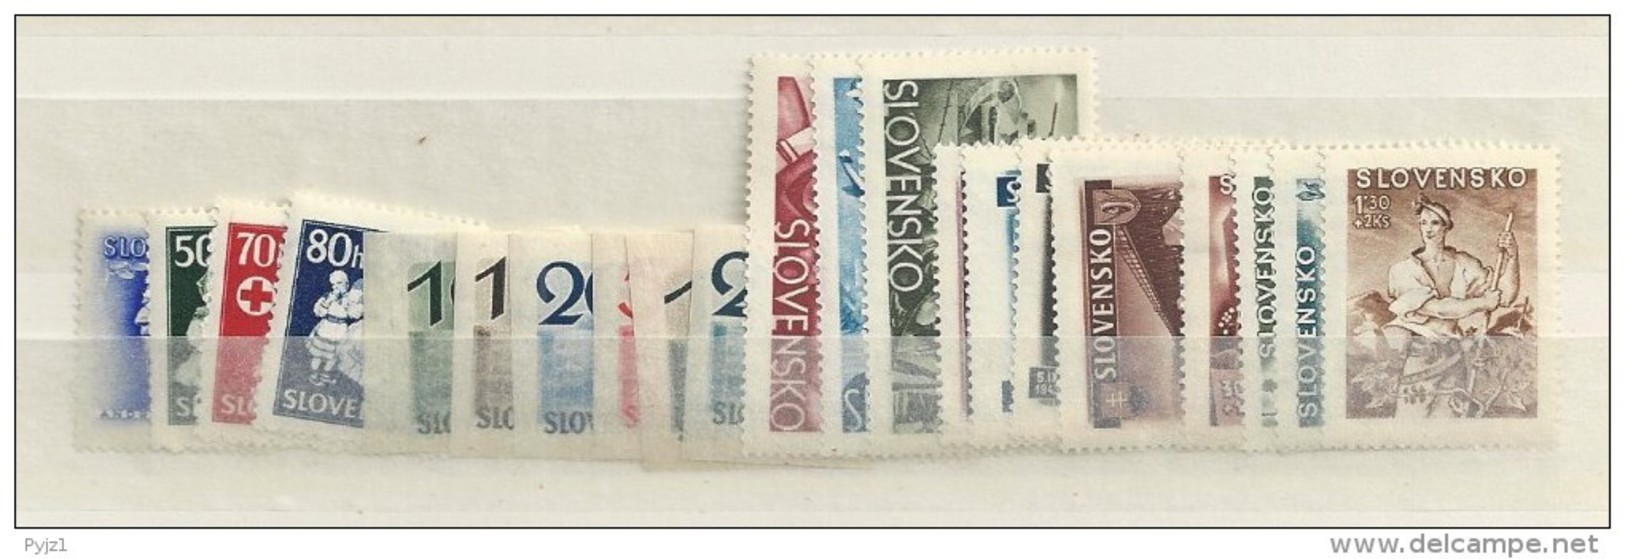 1943 MH Year Collection Slowakei, Slovensko - Unused Stamps